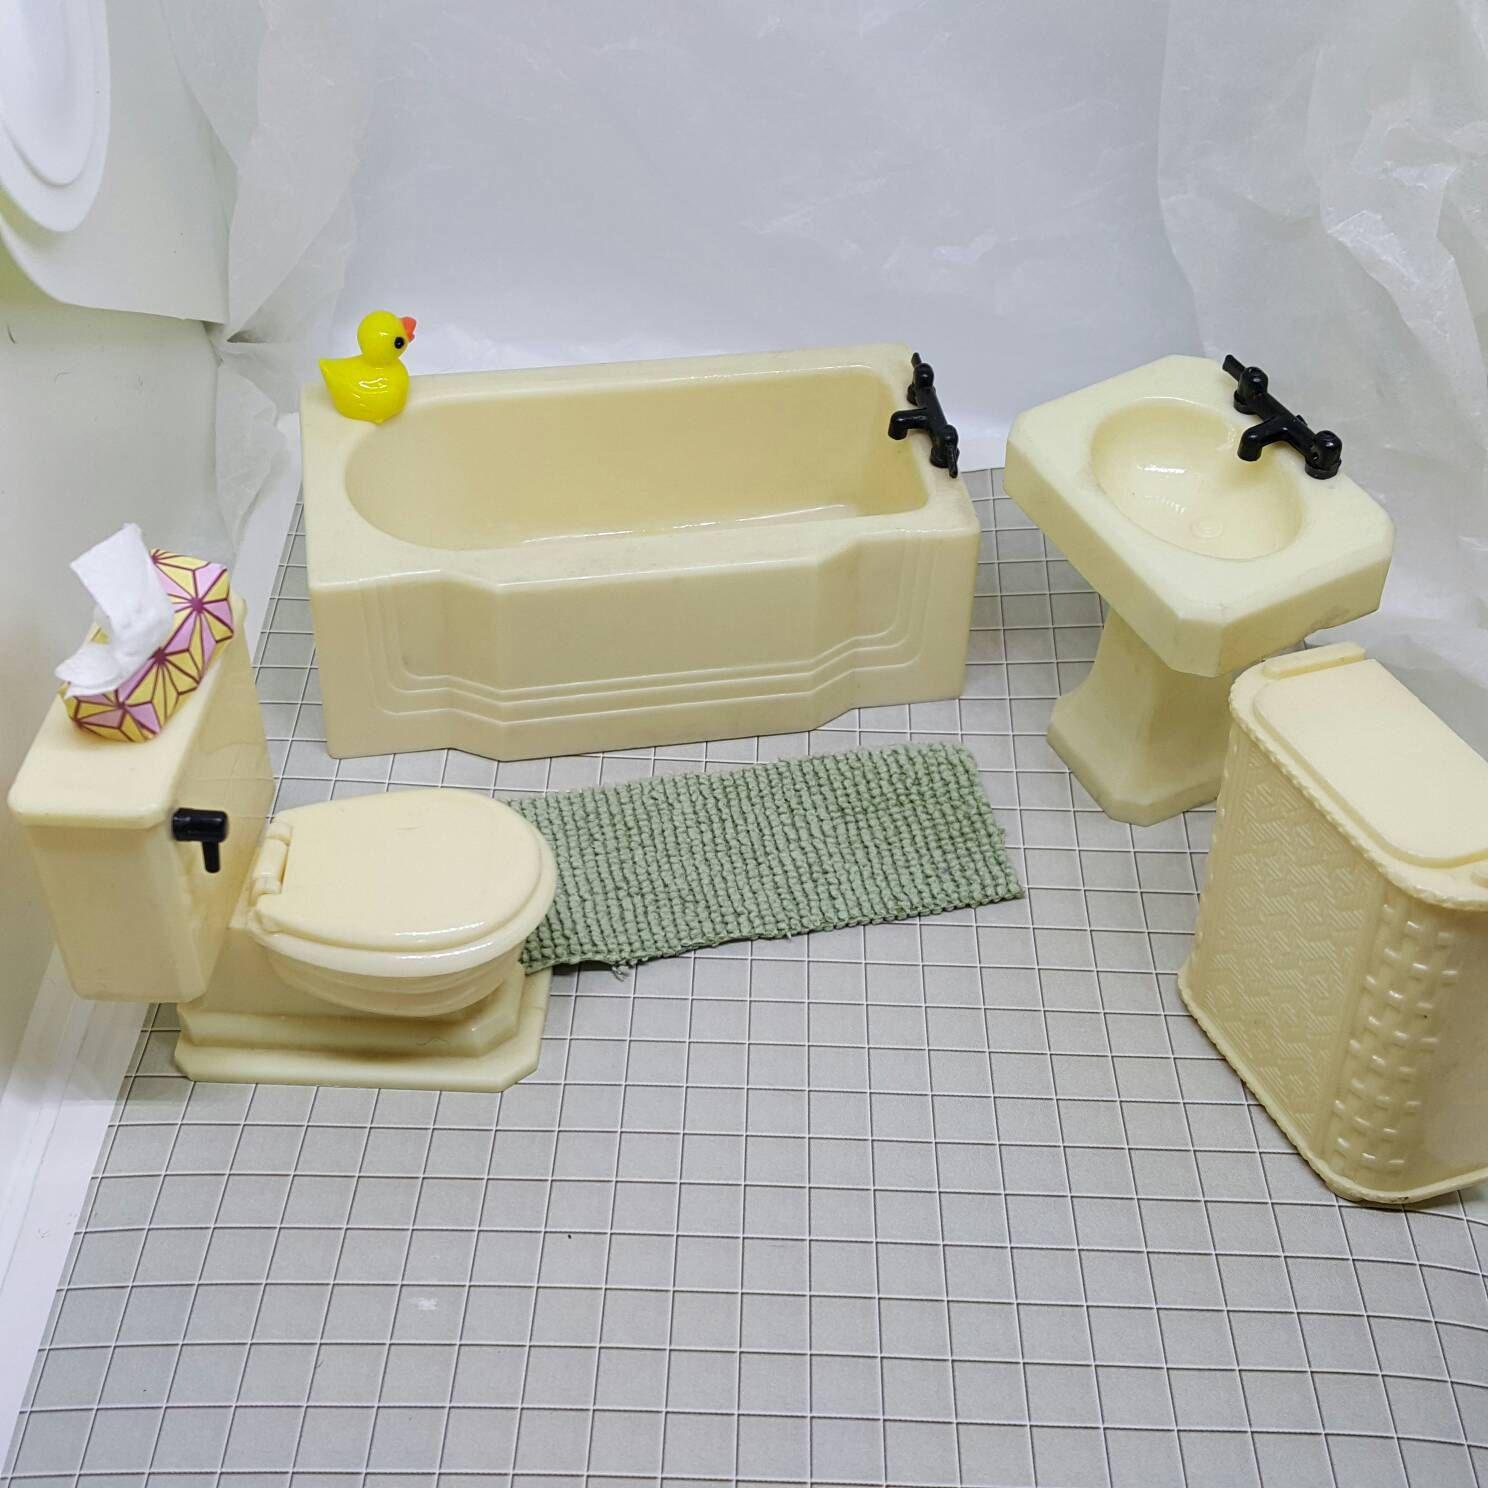 Renwal Sink Tub Hamper and Toilet Doll House Toy Bathroom Hard ...